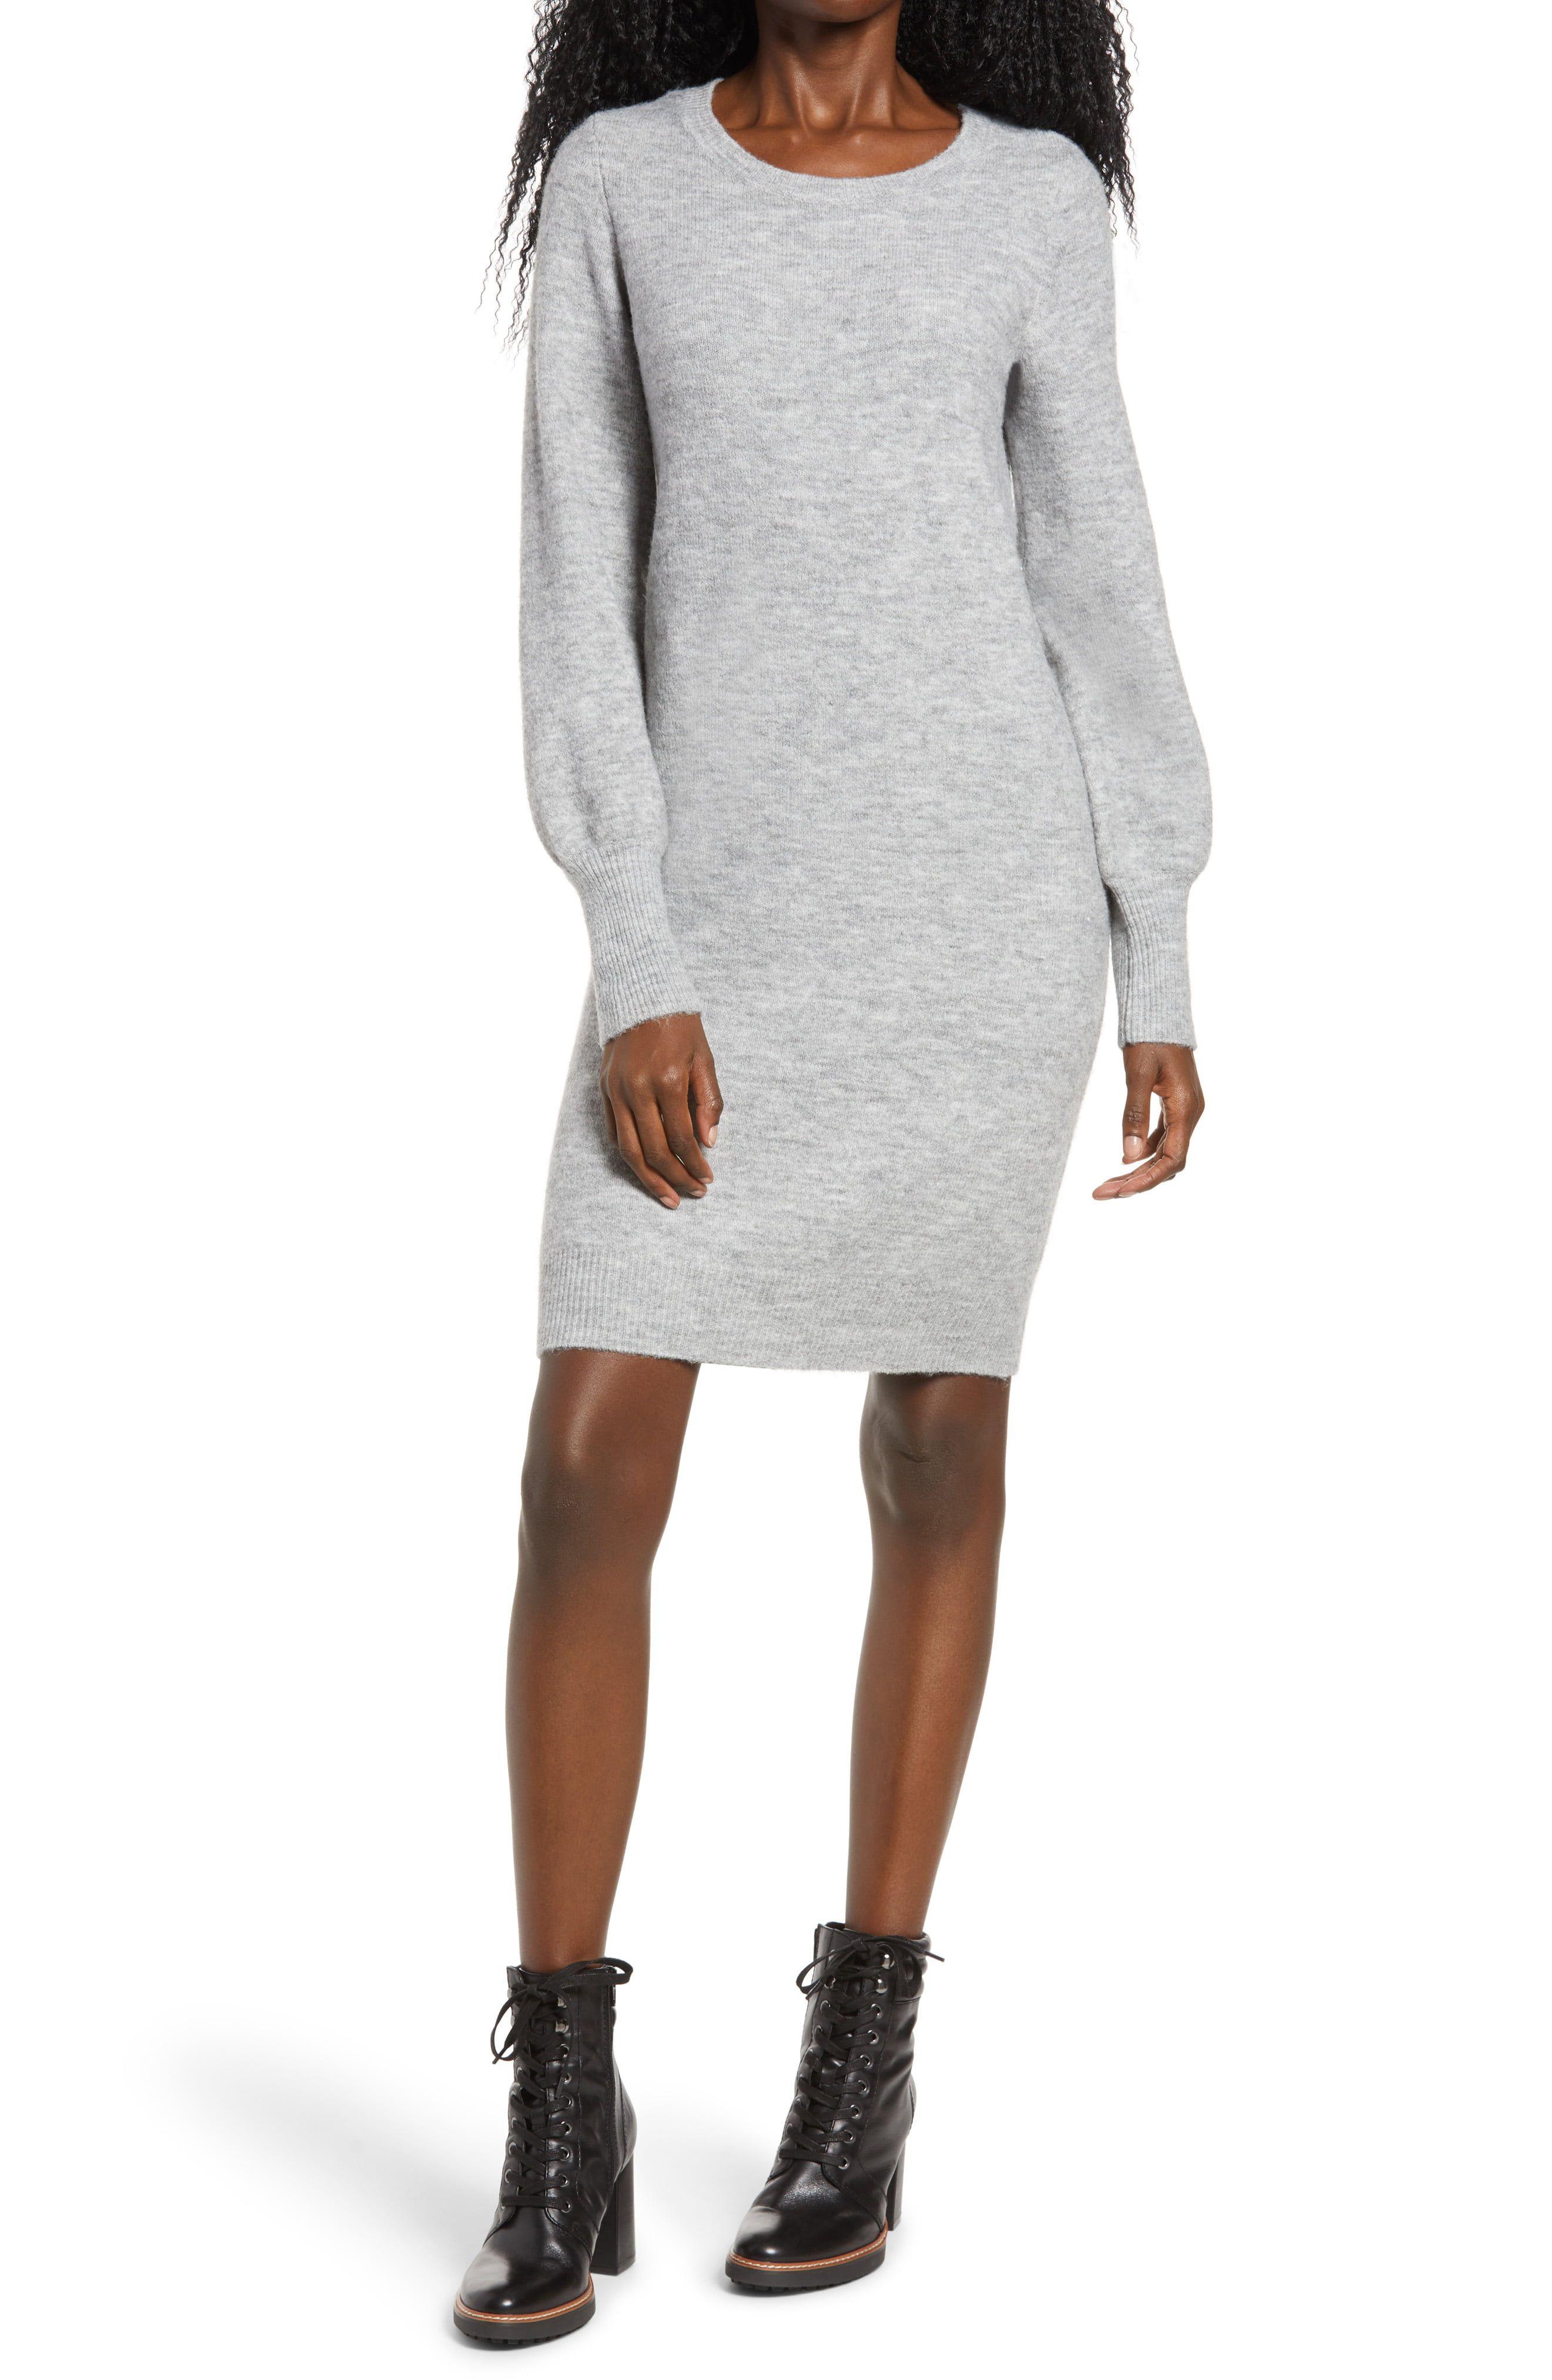 34+ Cashmere sweater dress info